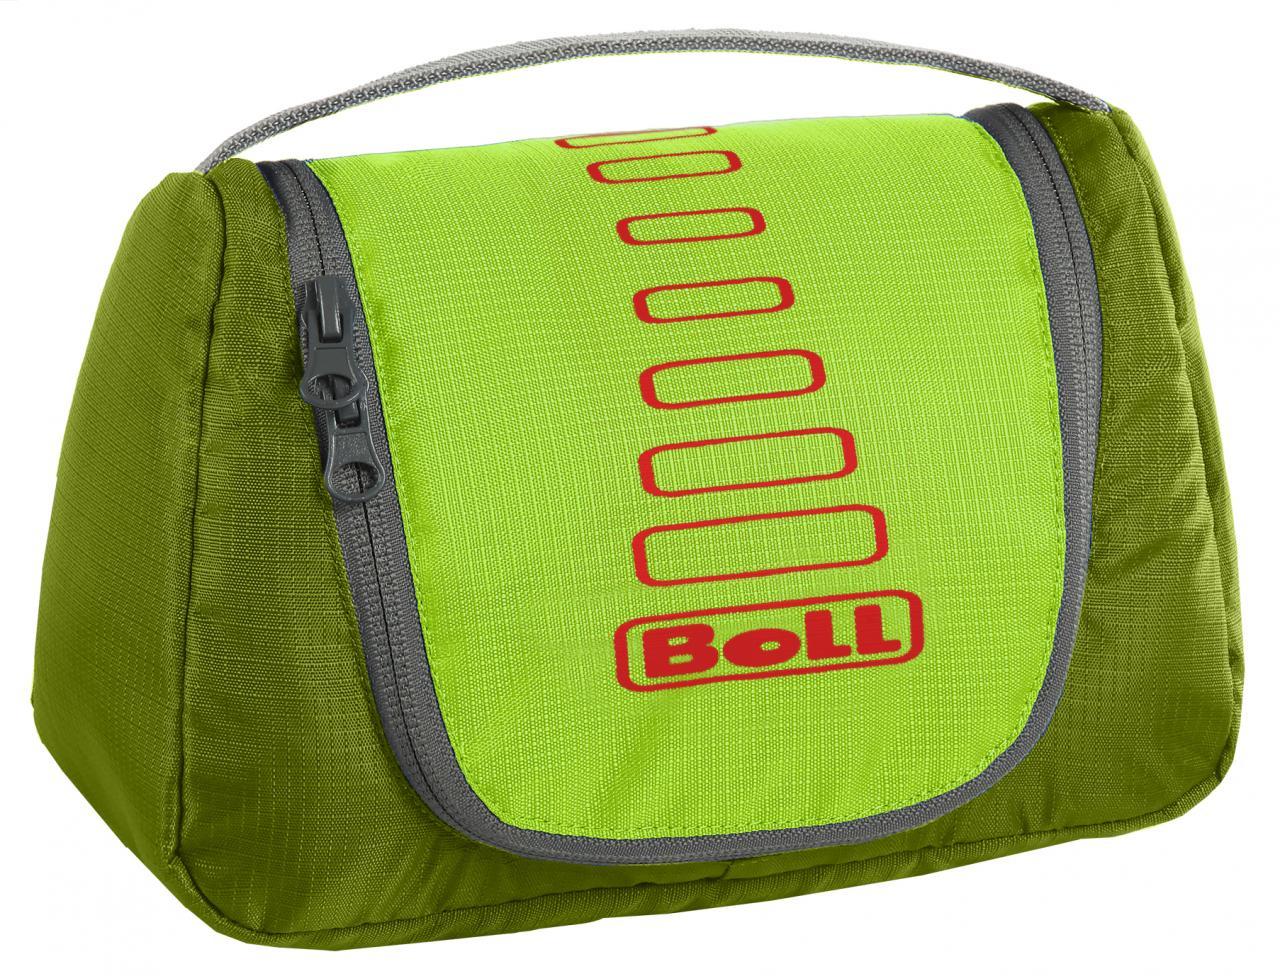 E-shop Boll Junior Washbag Lime